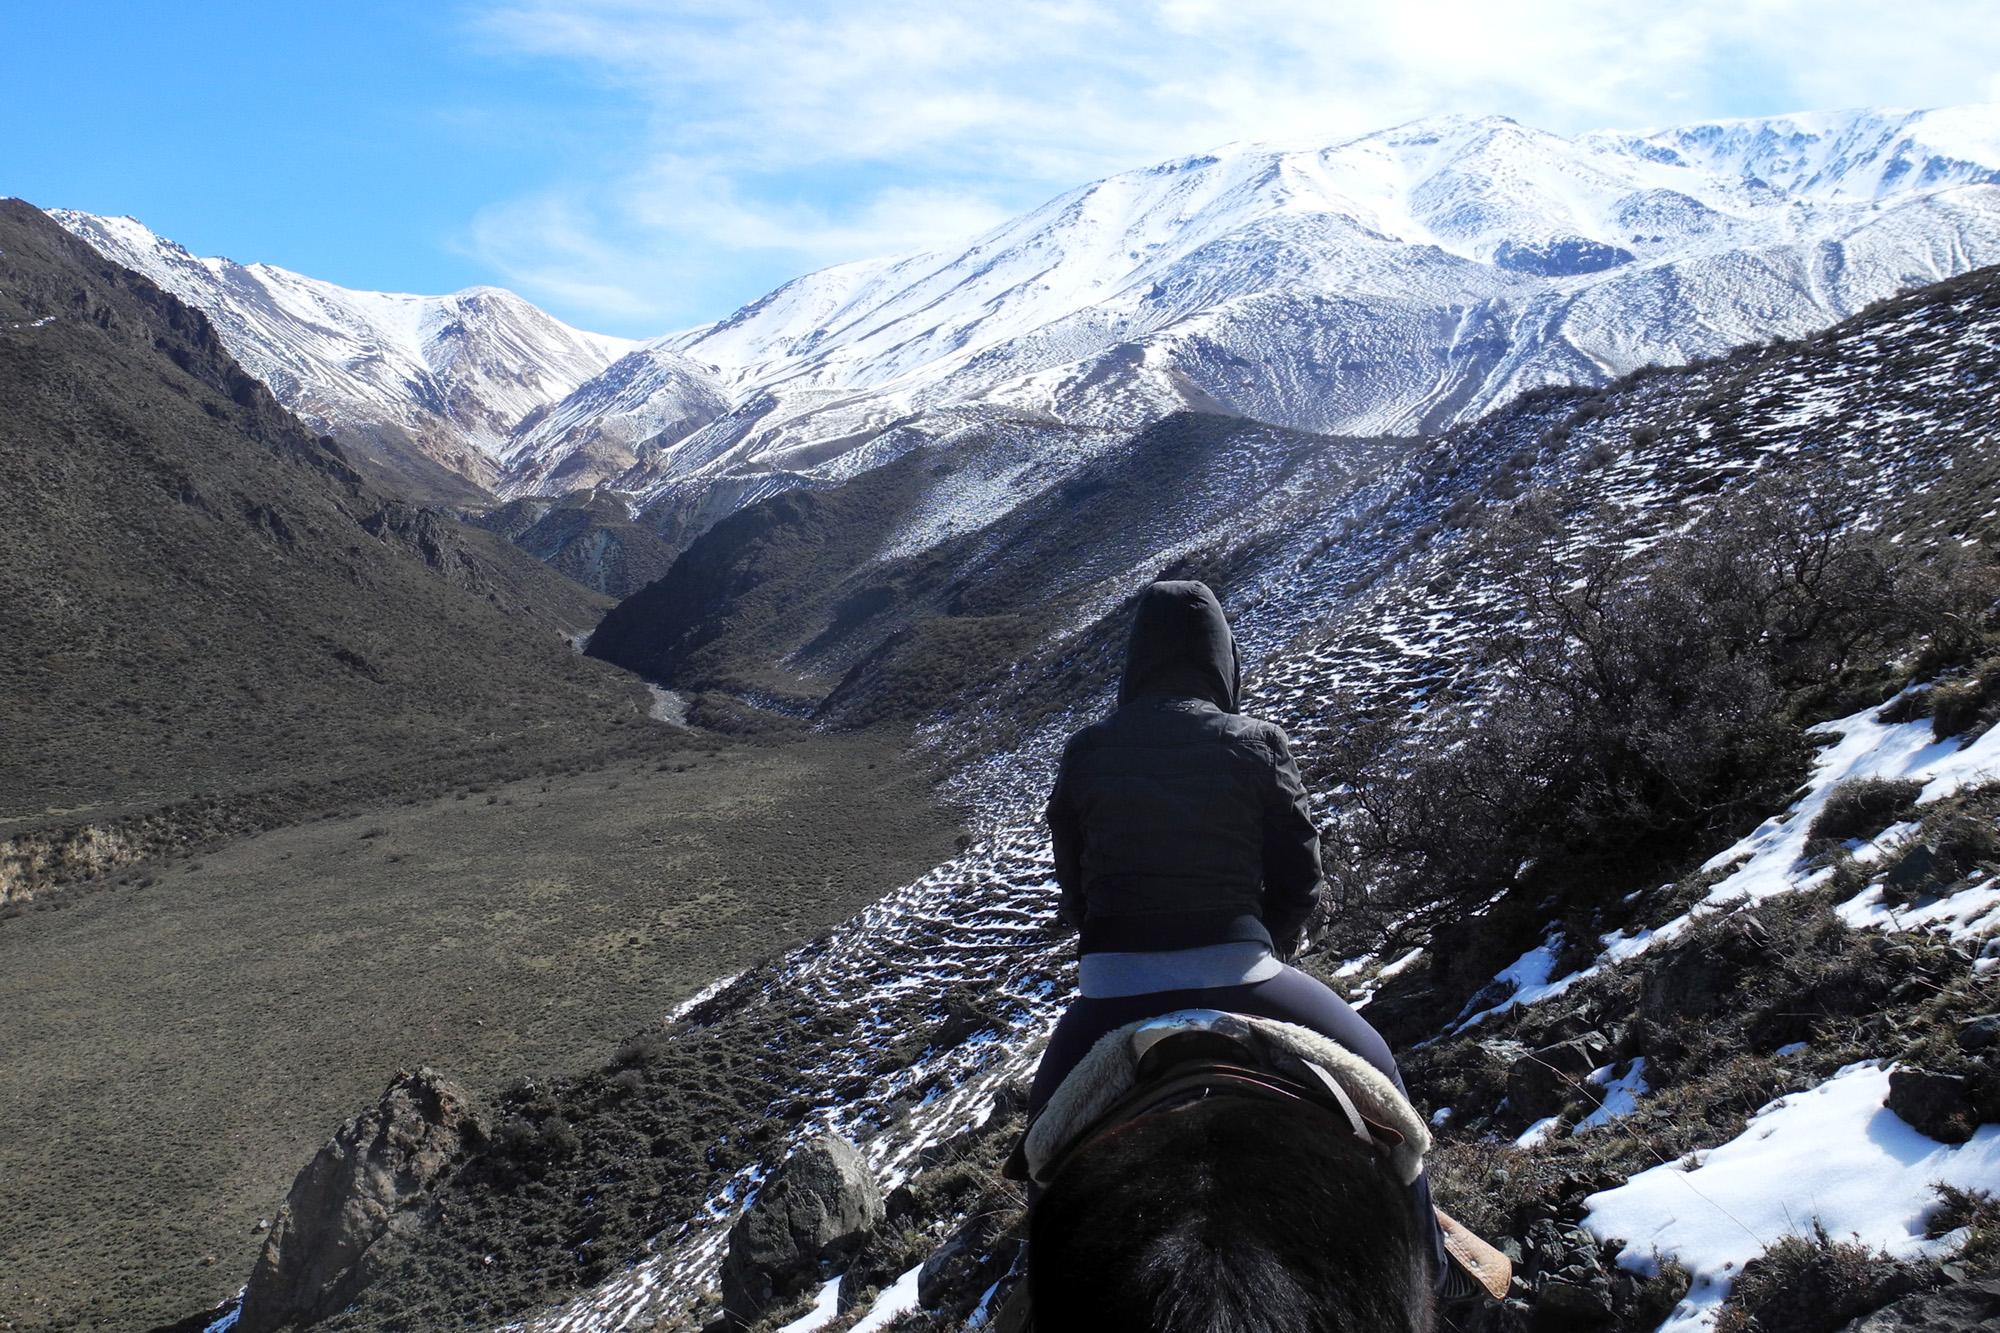 wine-TROTTERS_oenotourisme_wine-tourism-agency_tour_vino_vin_turismo_ARGENTINA_Mendoza_trekking_hiking_horseback-riding_alta-montana_Andes_92_WEB-2000px.jpg